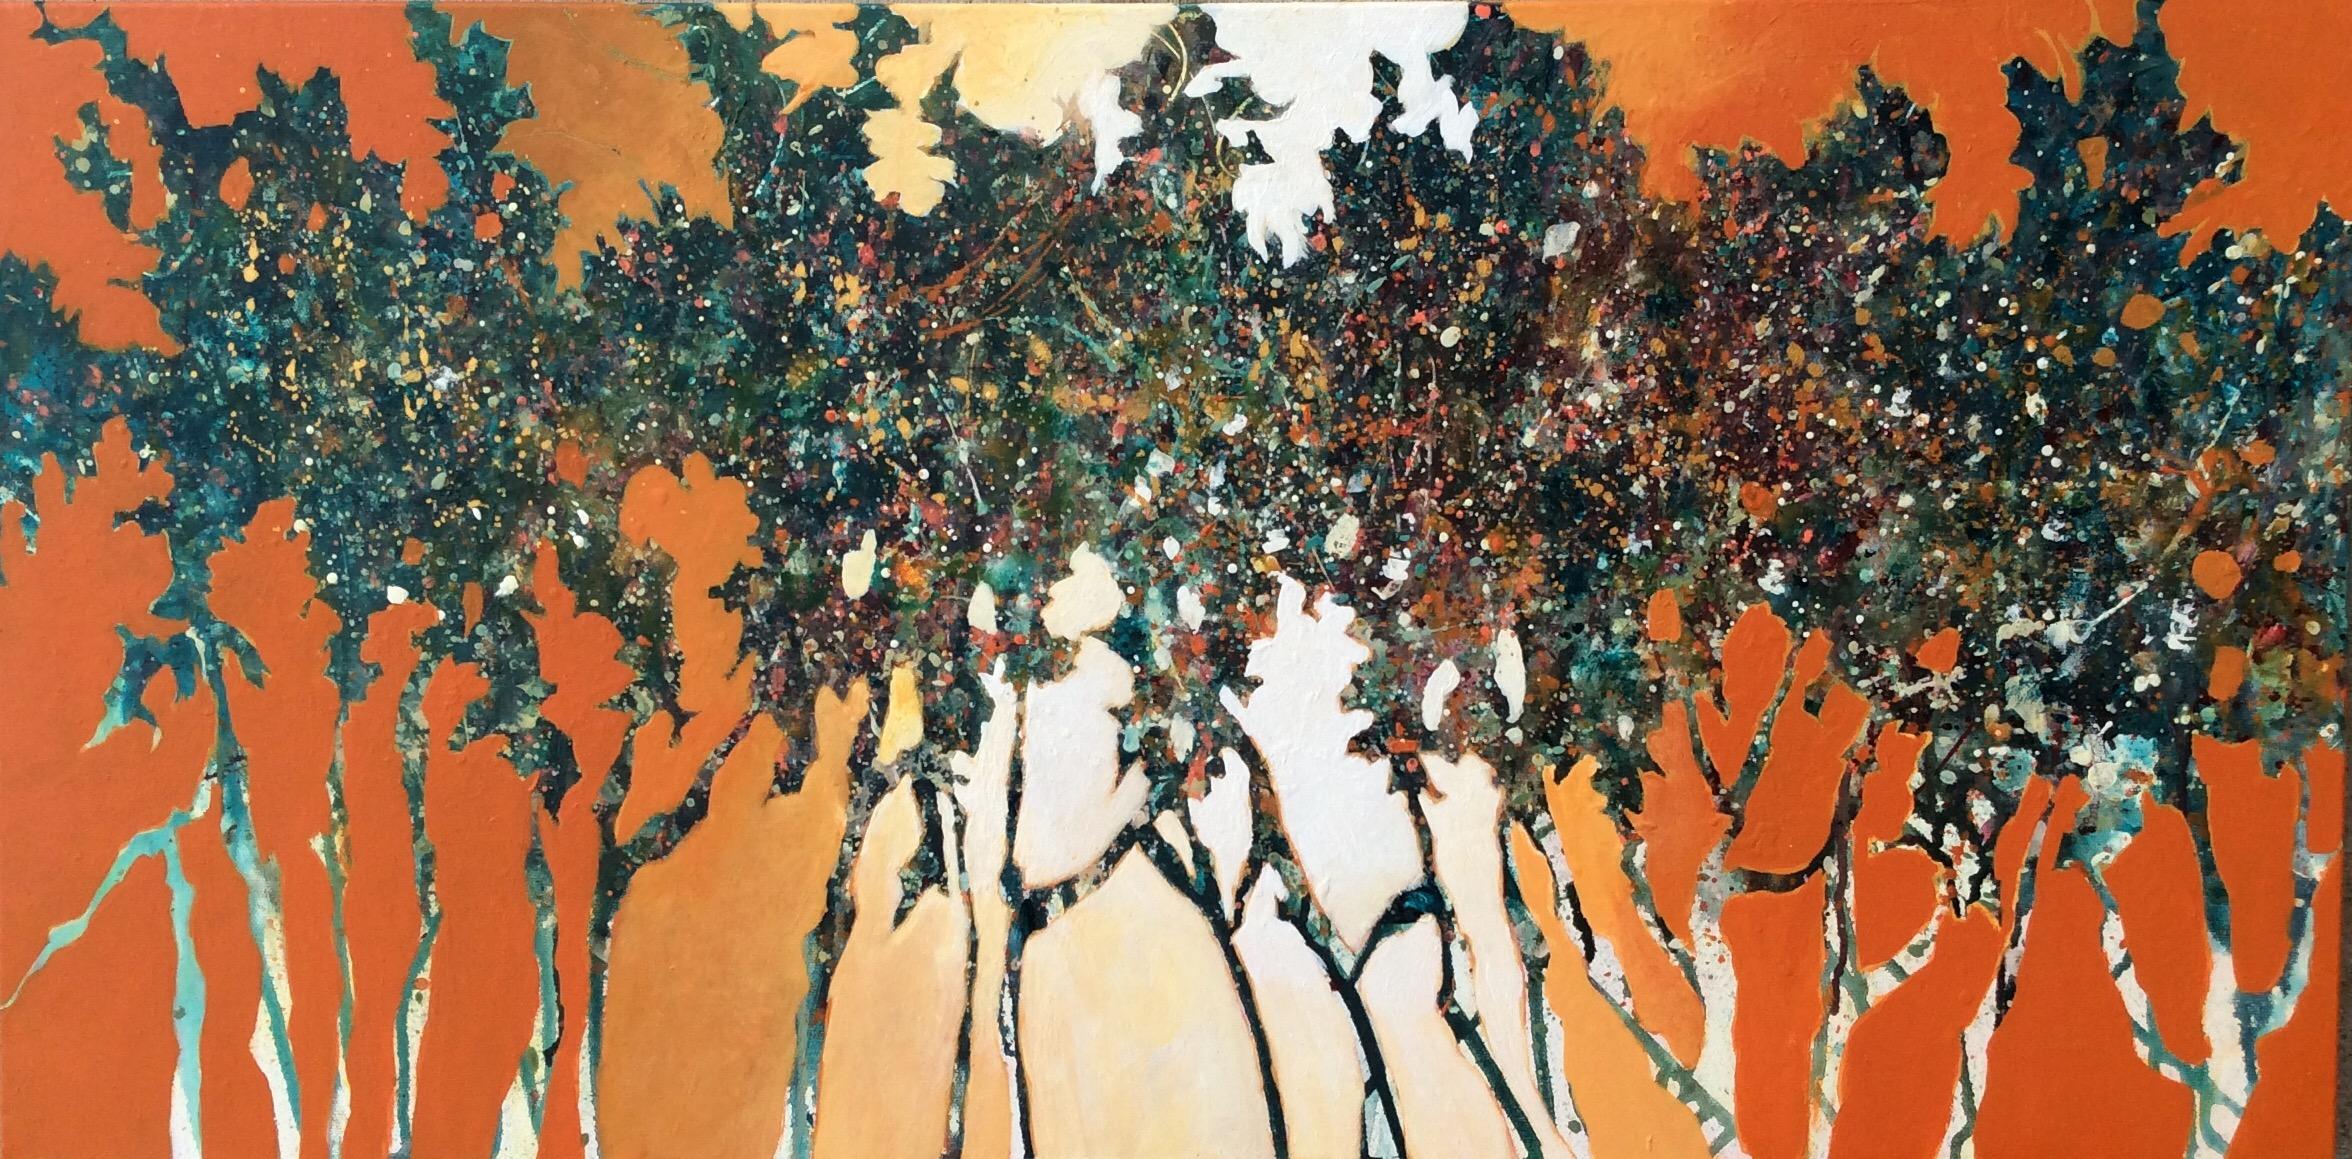 Commission. SOLD by Jennifer Stone at Jennifer Stone Artwork